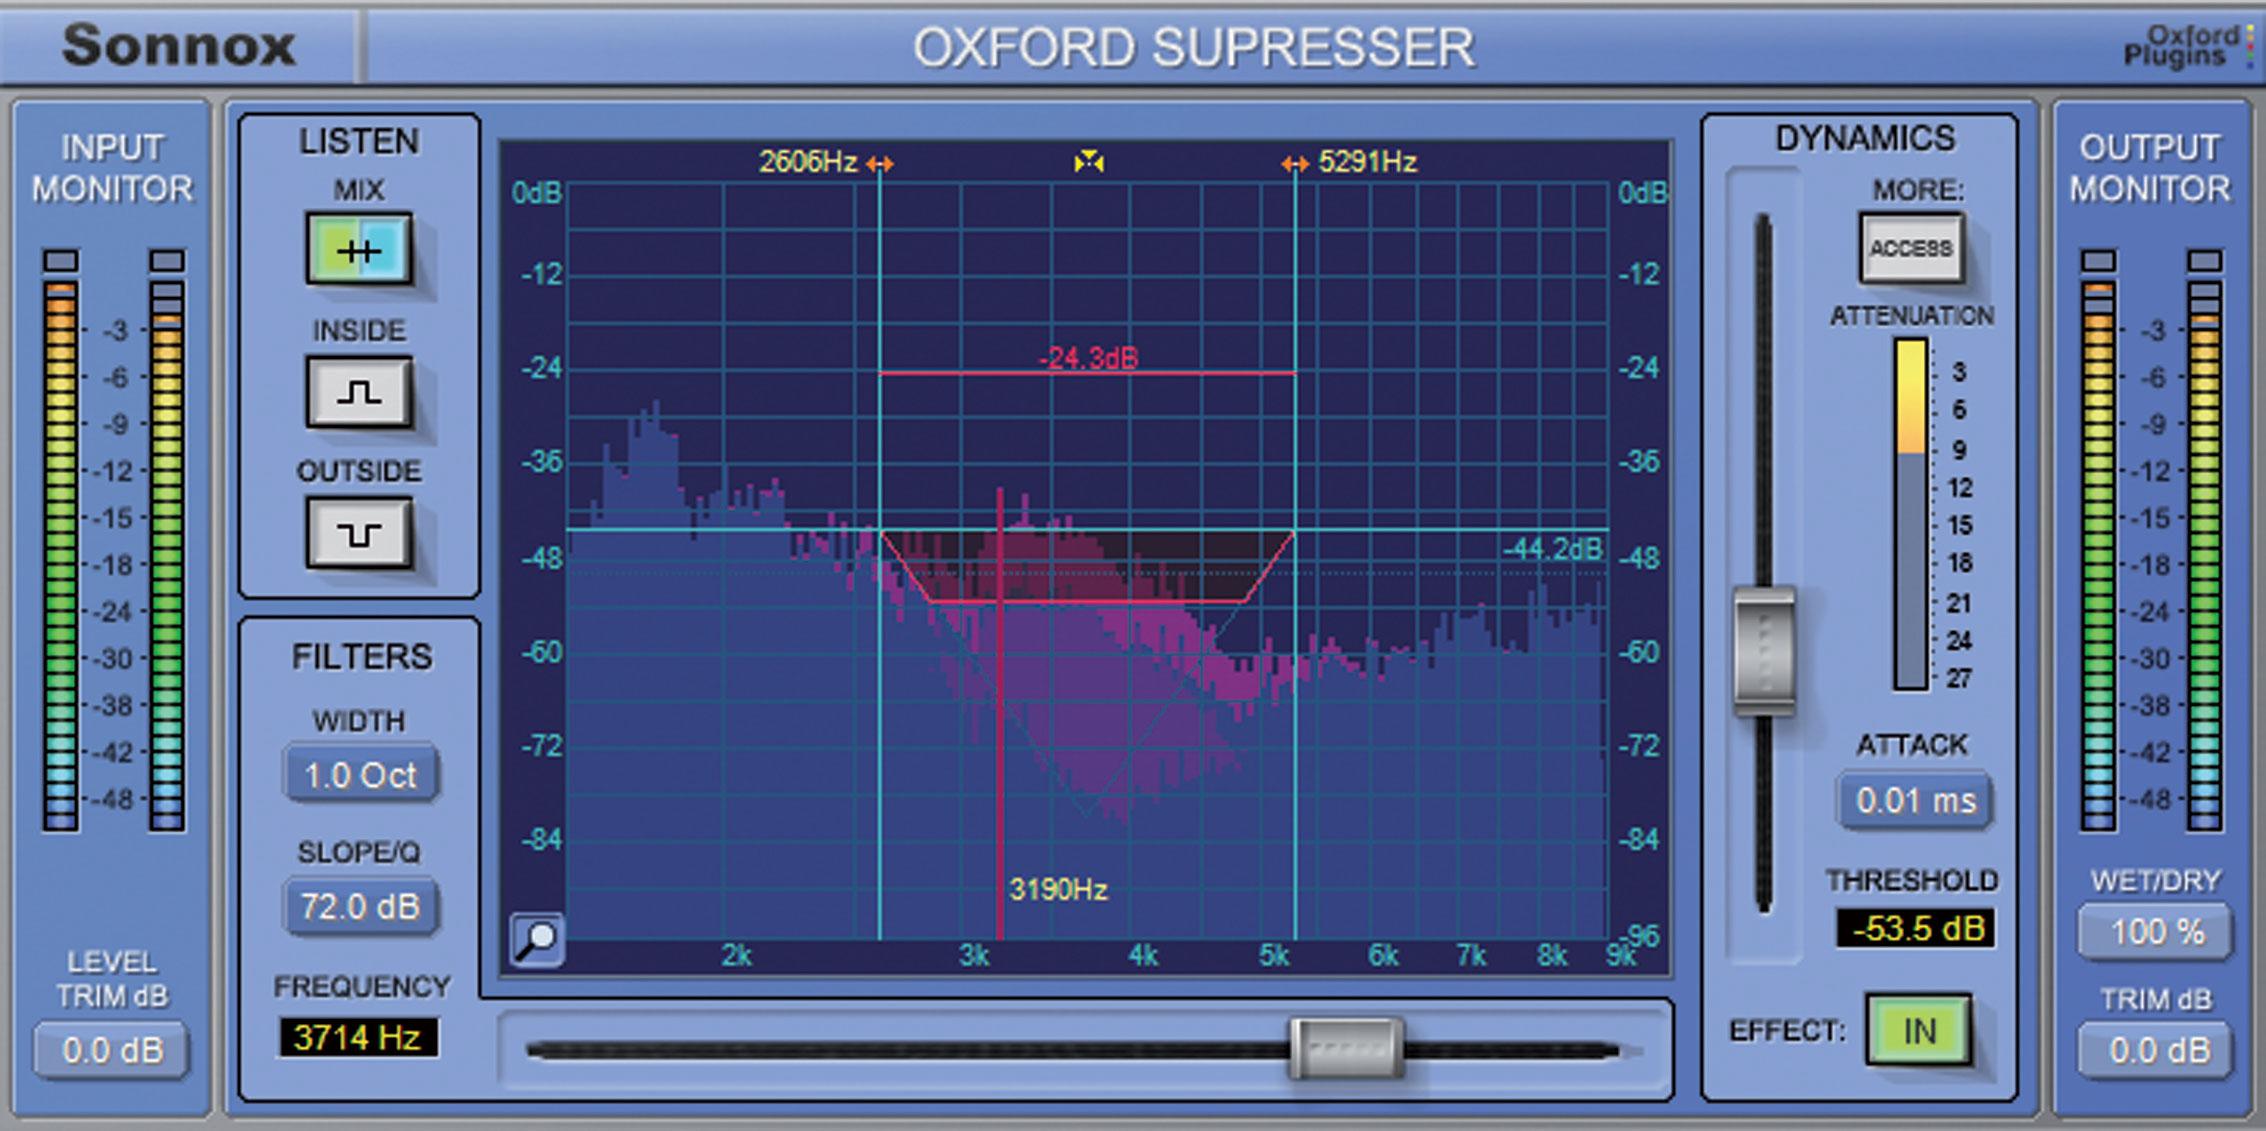 Oxford SuprEsser